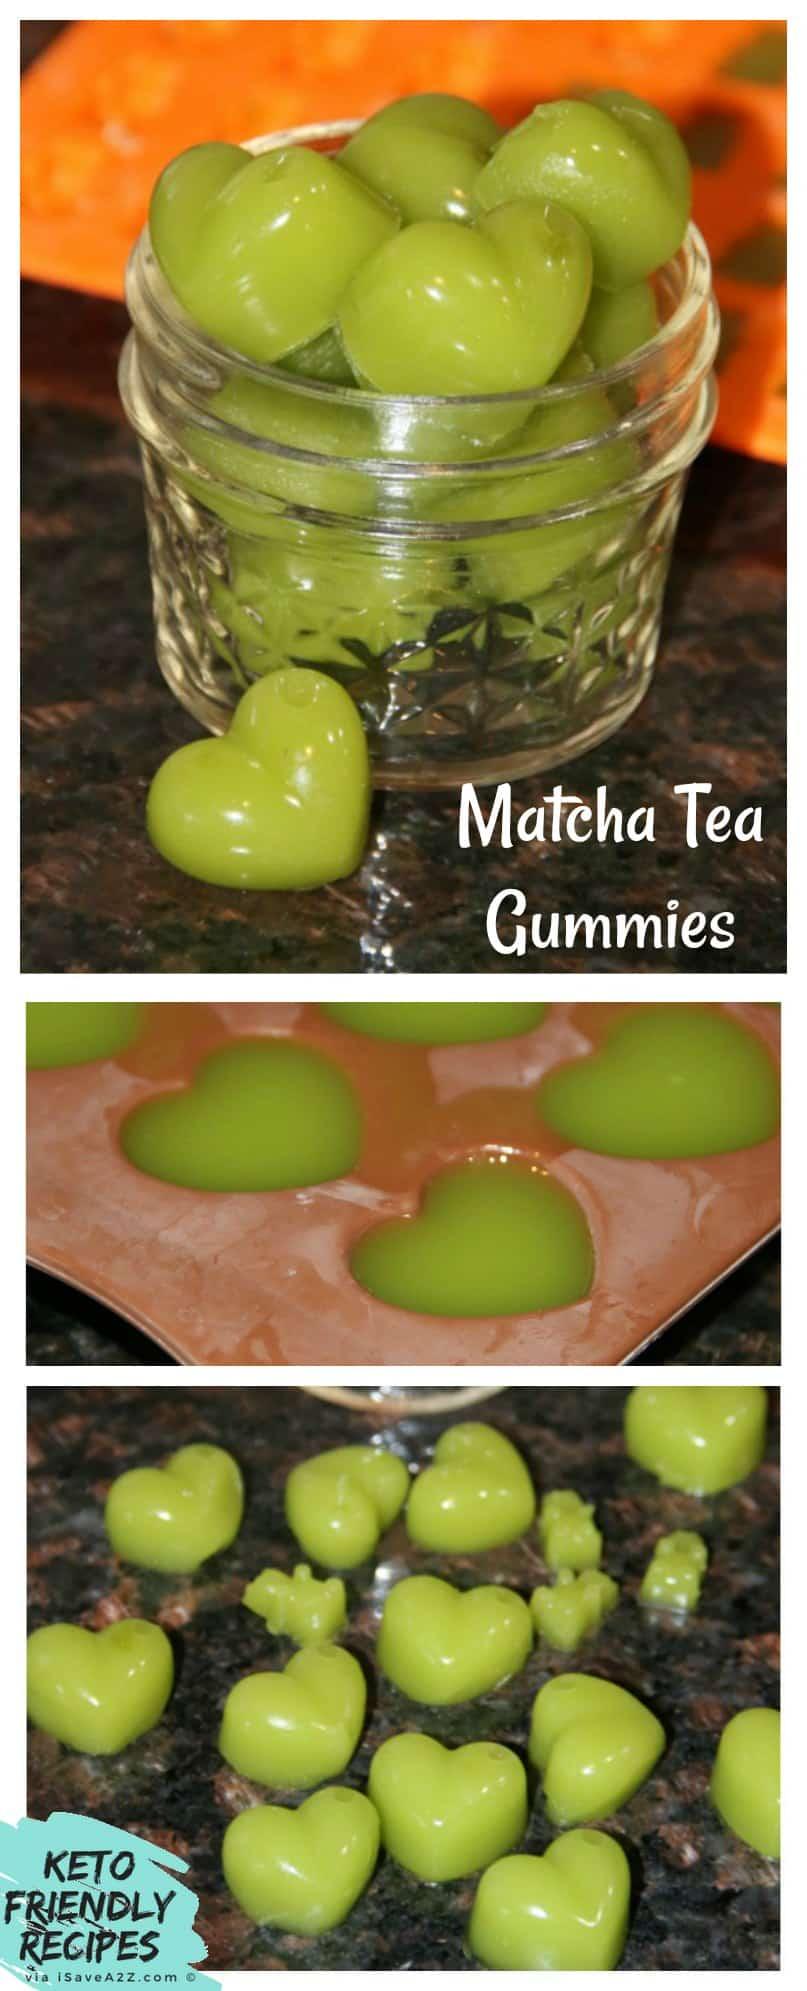 Matcha Tea Gummies Recipe